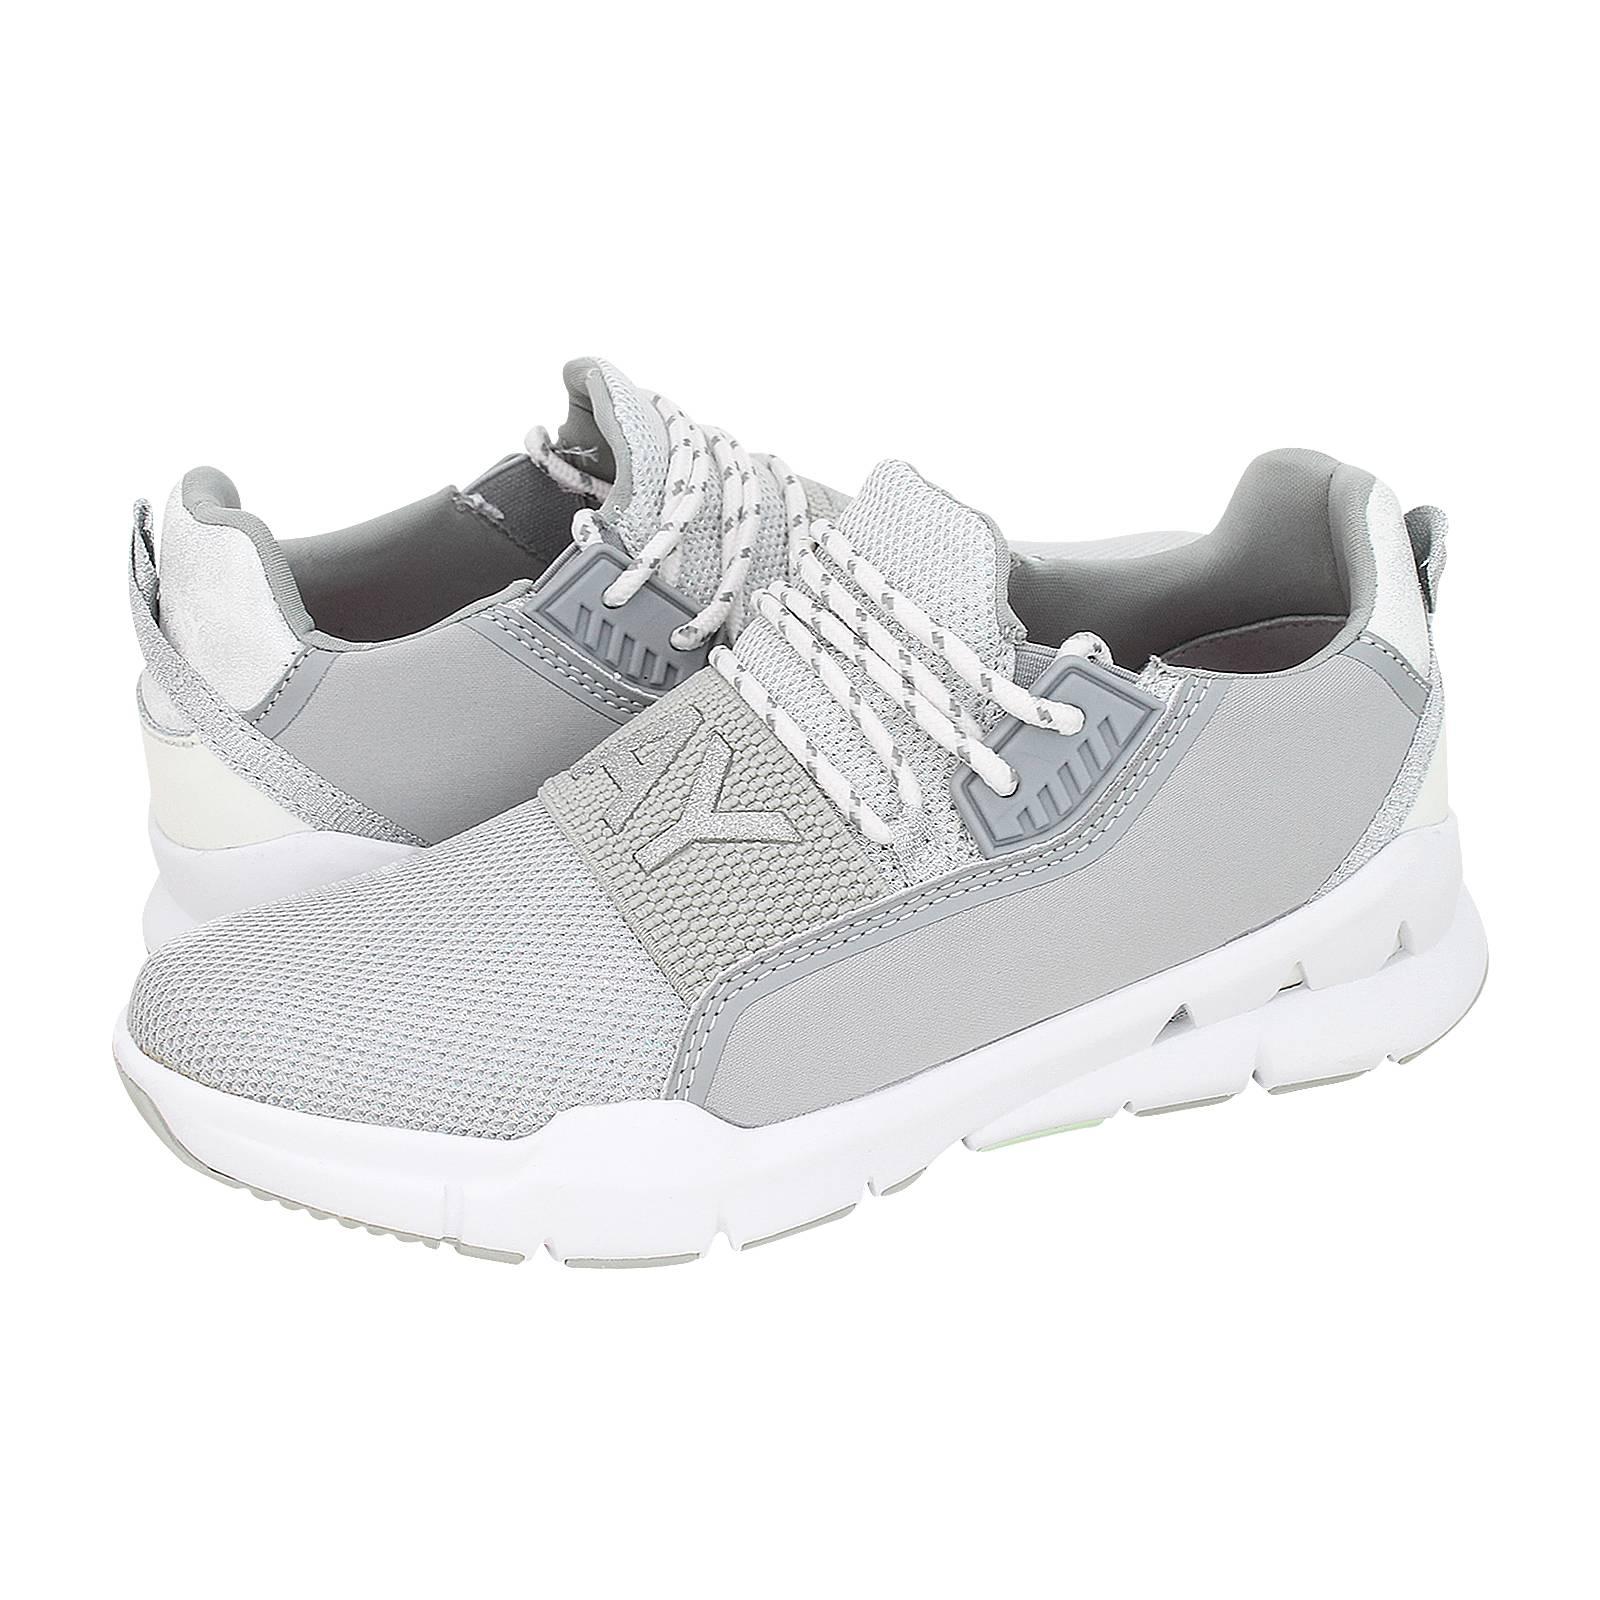 0c9b758af62 Παπούτσια casual Replay Shari